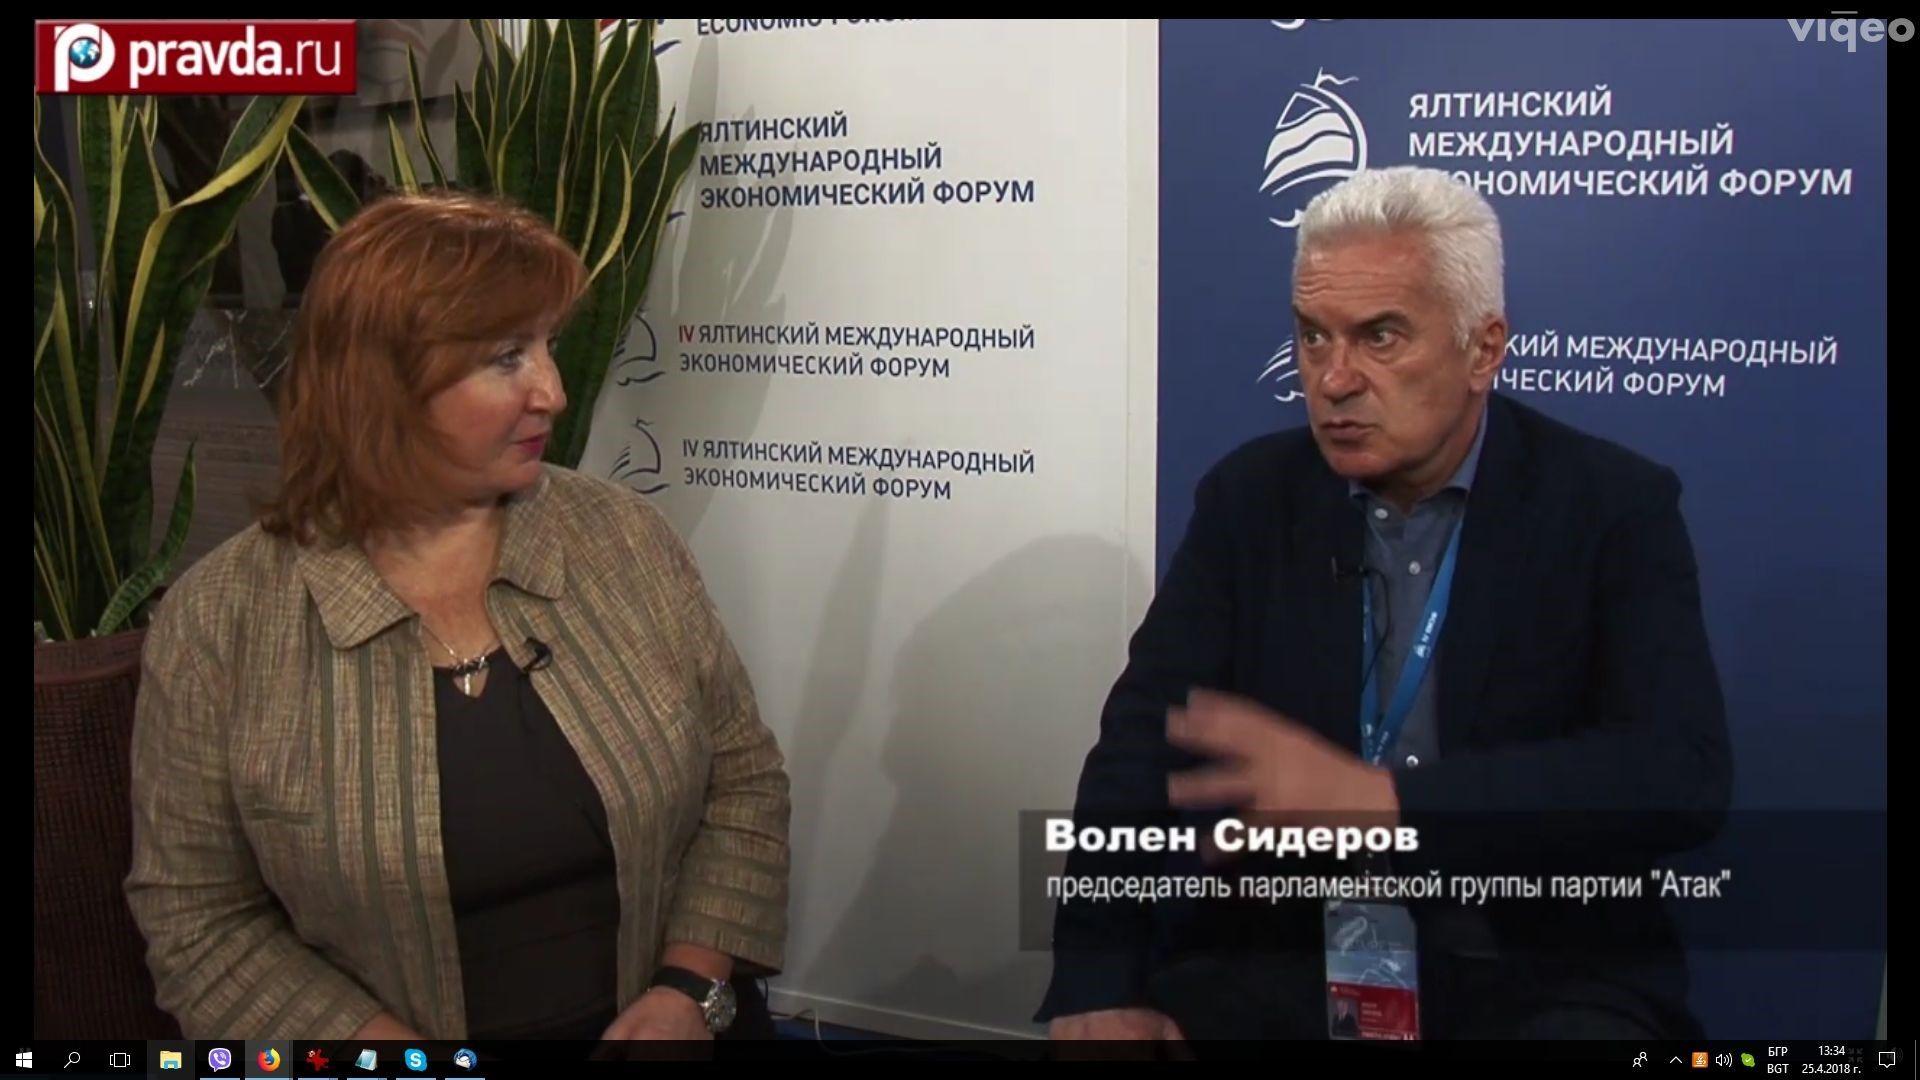 Волен Сидеров говори на руски, допускайки някои грешки